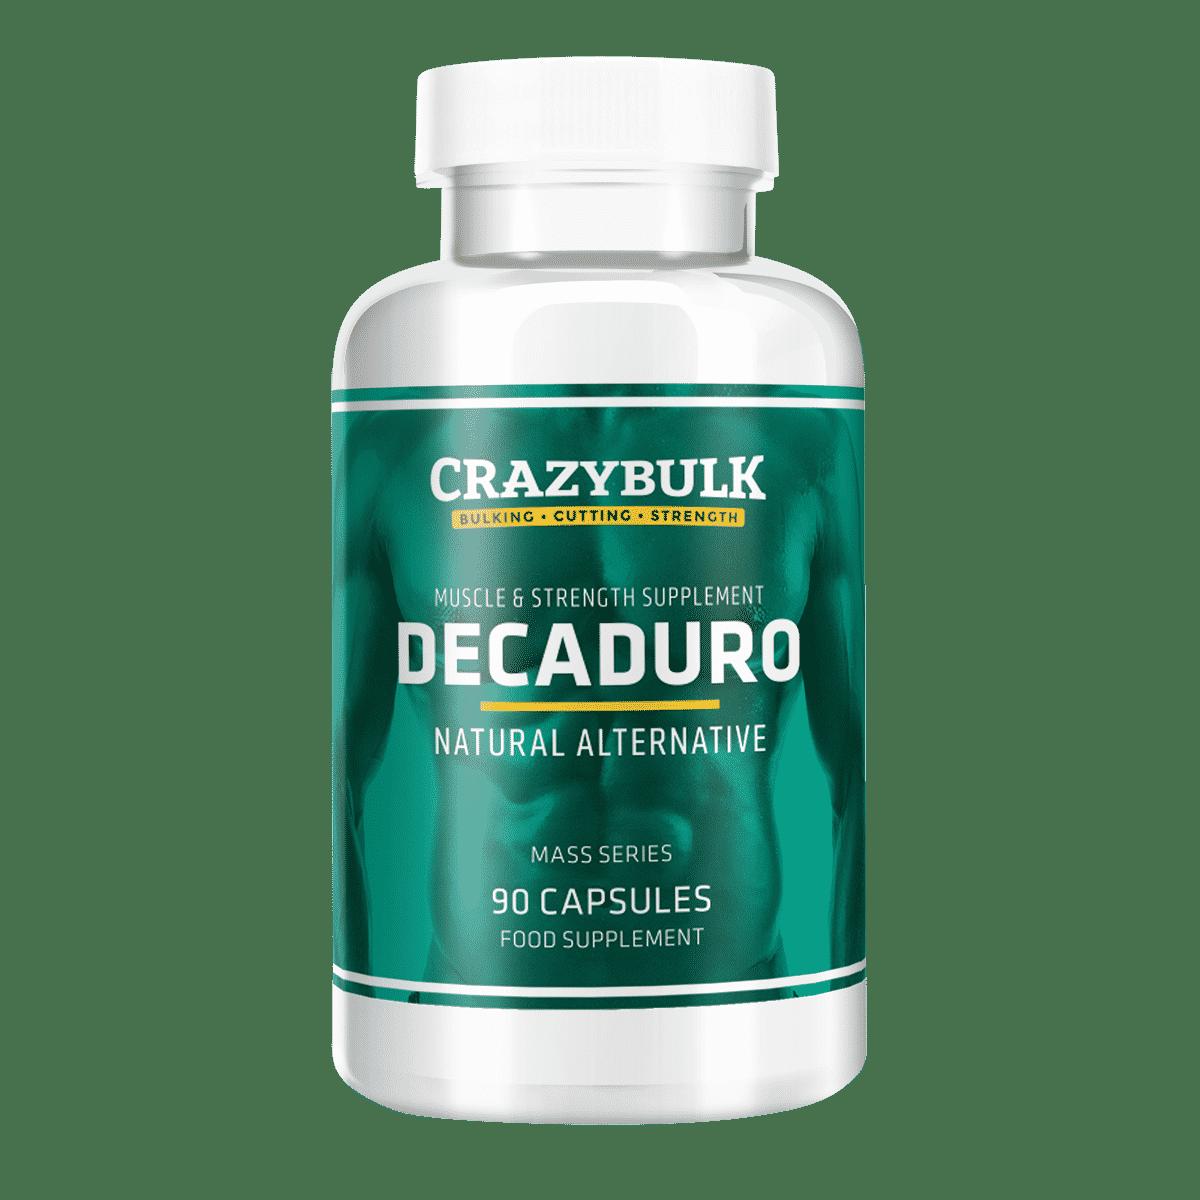 Deca Durabolin : Avis, effets et alternative légale stéroïde